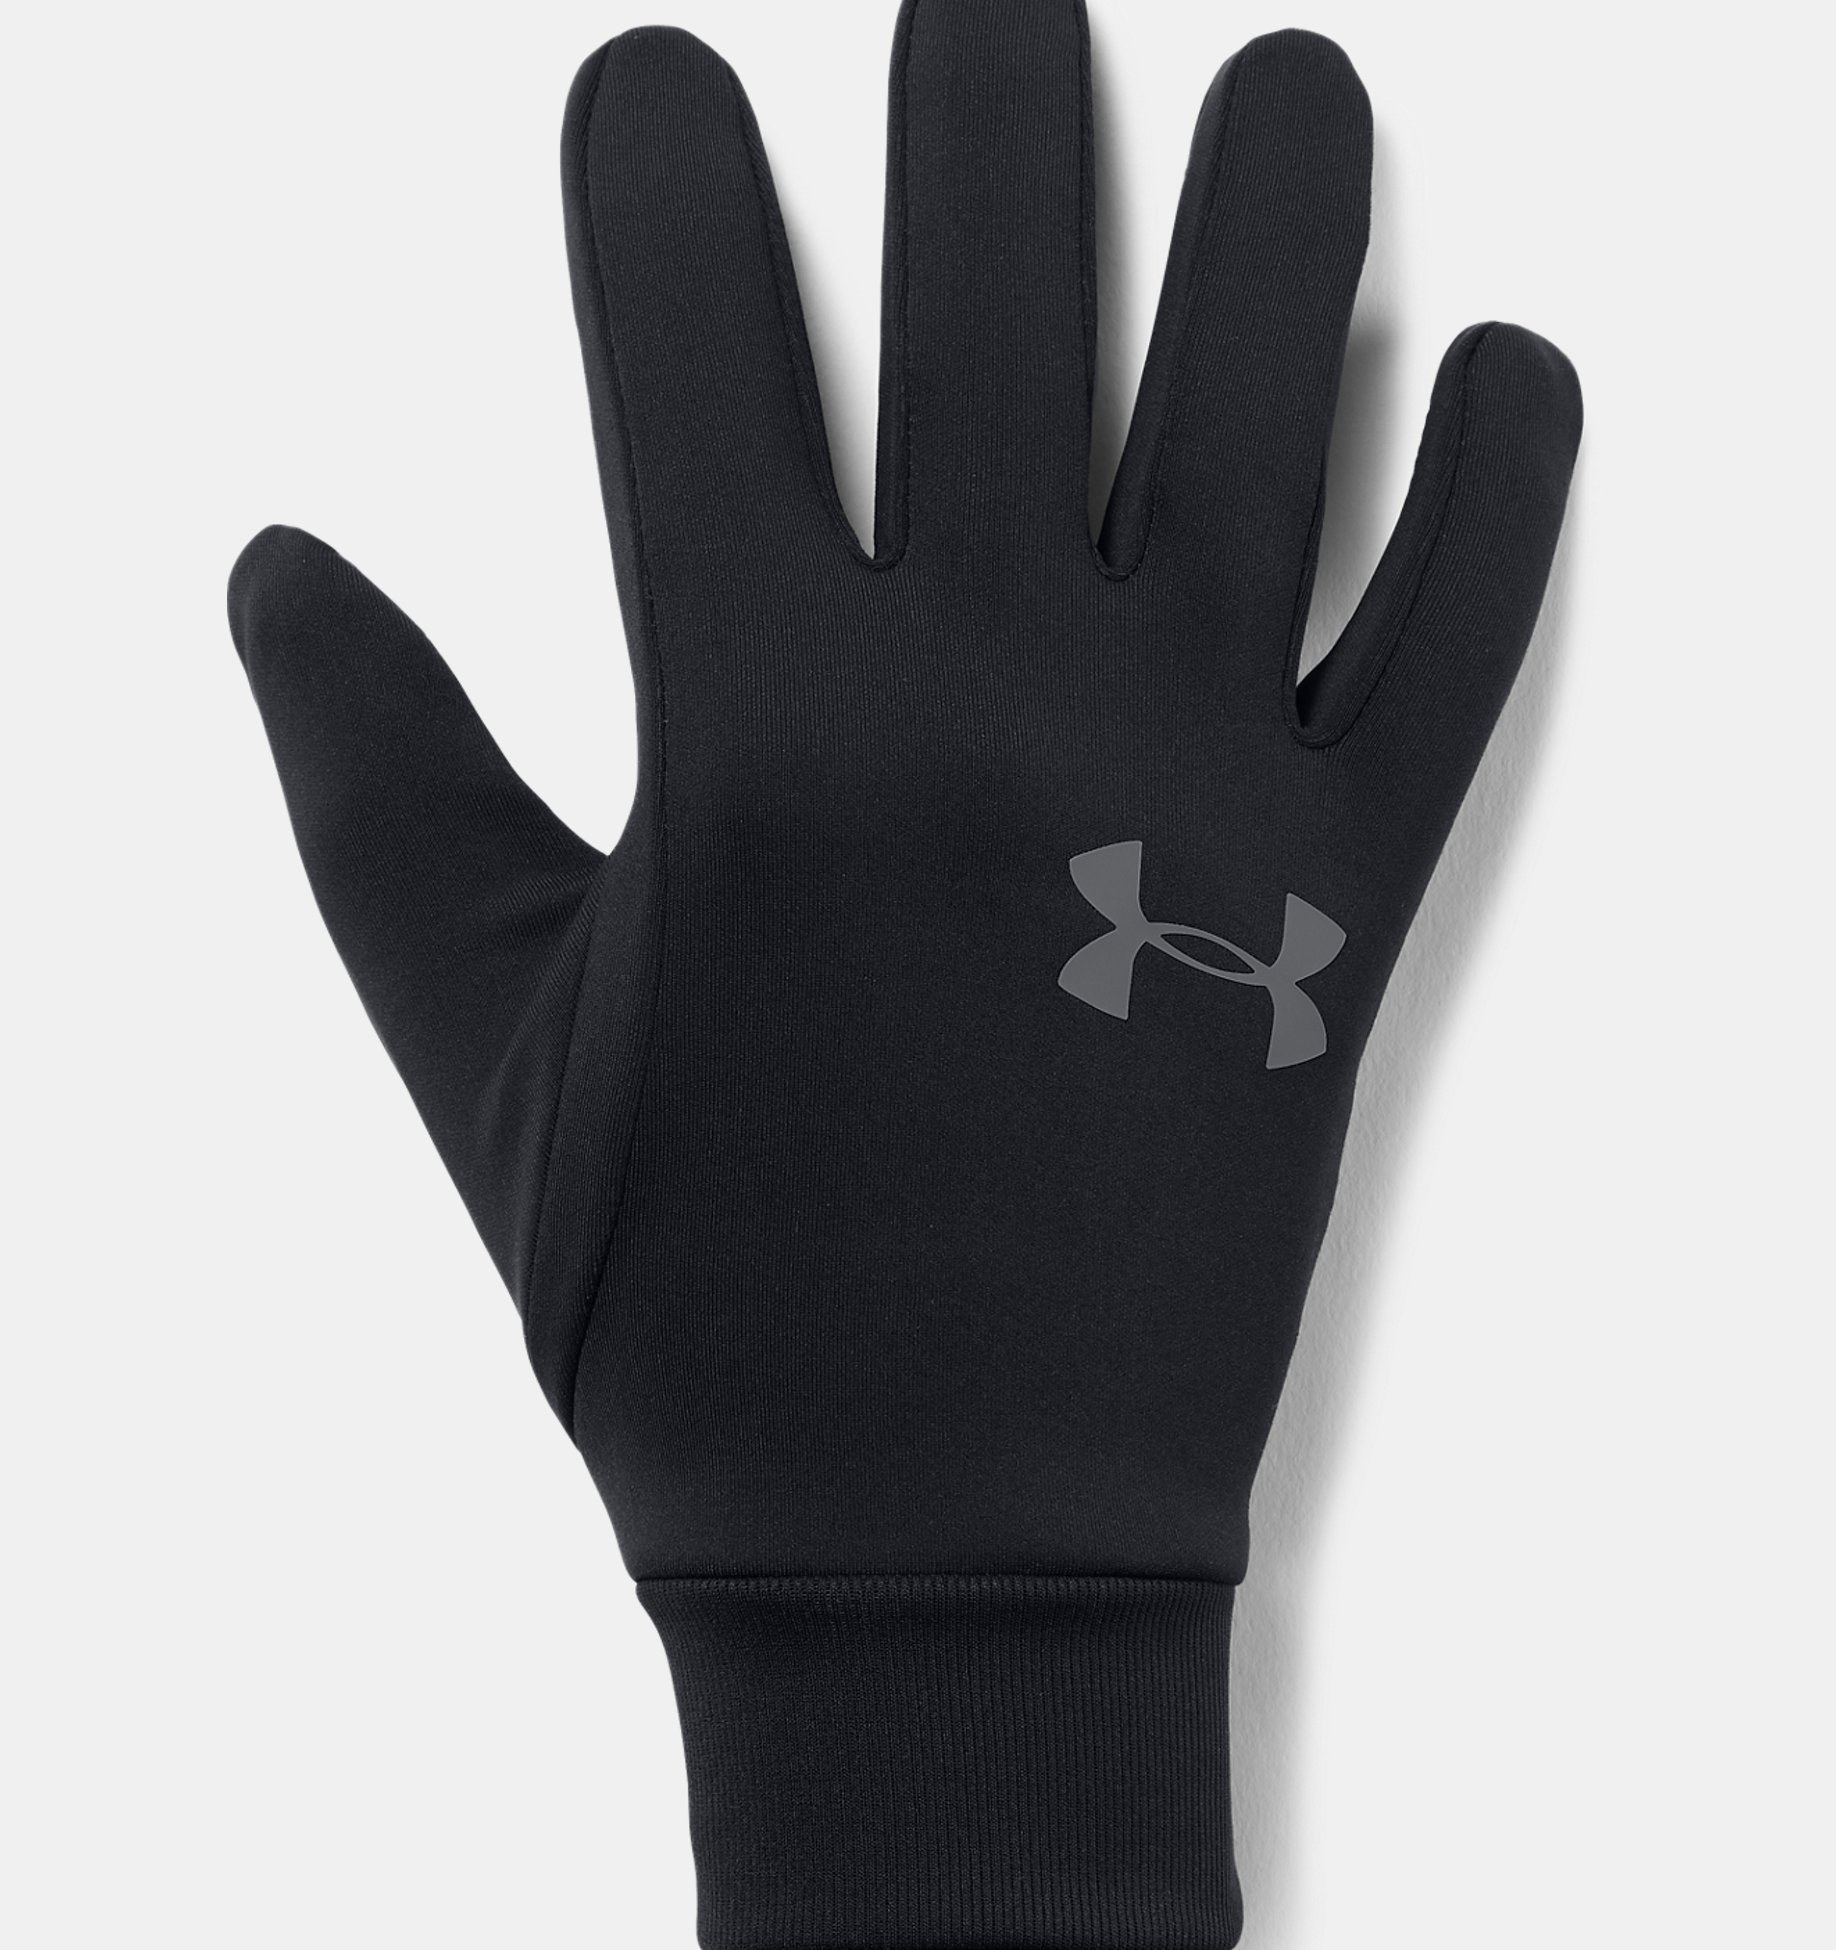 esta juego Decir  Men's UA Armour® Liner 2.0 Gloves | Under Armour